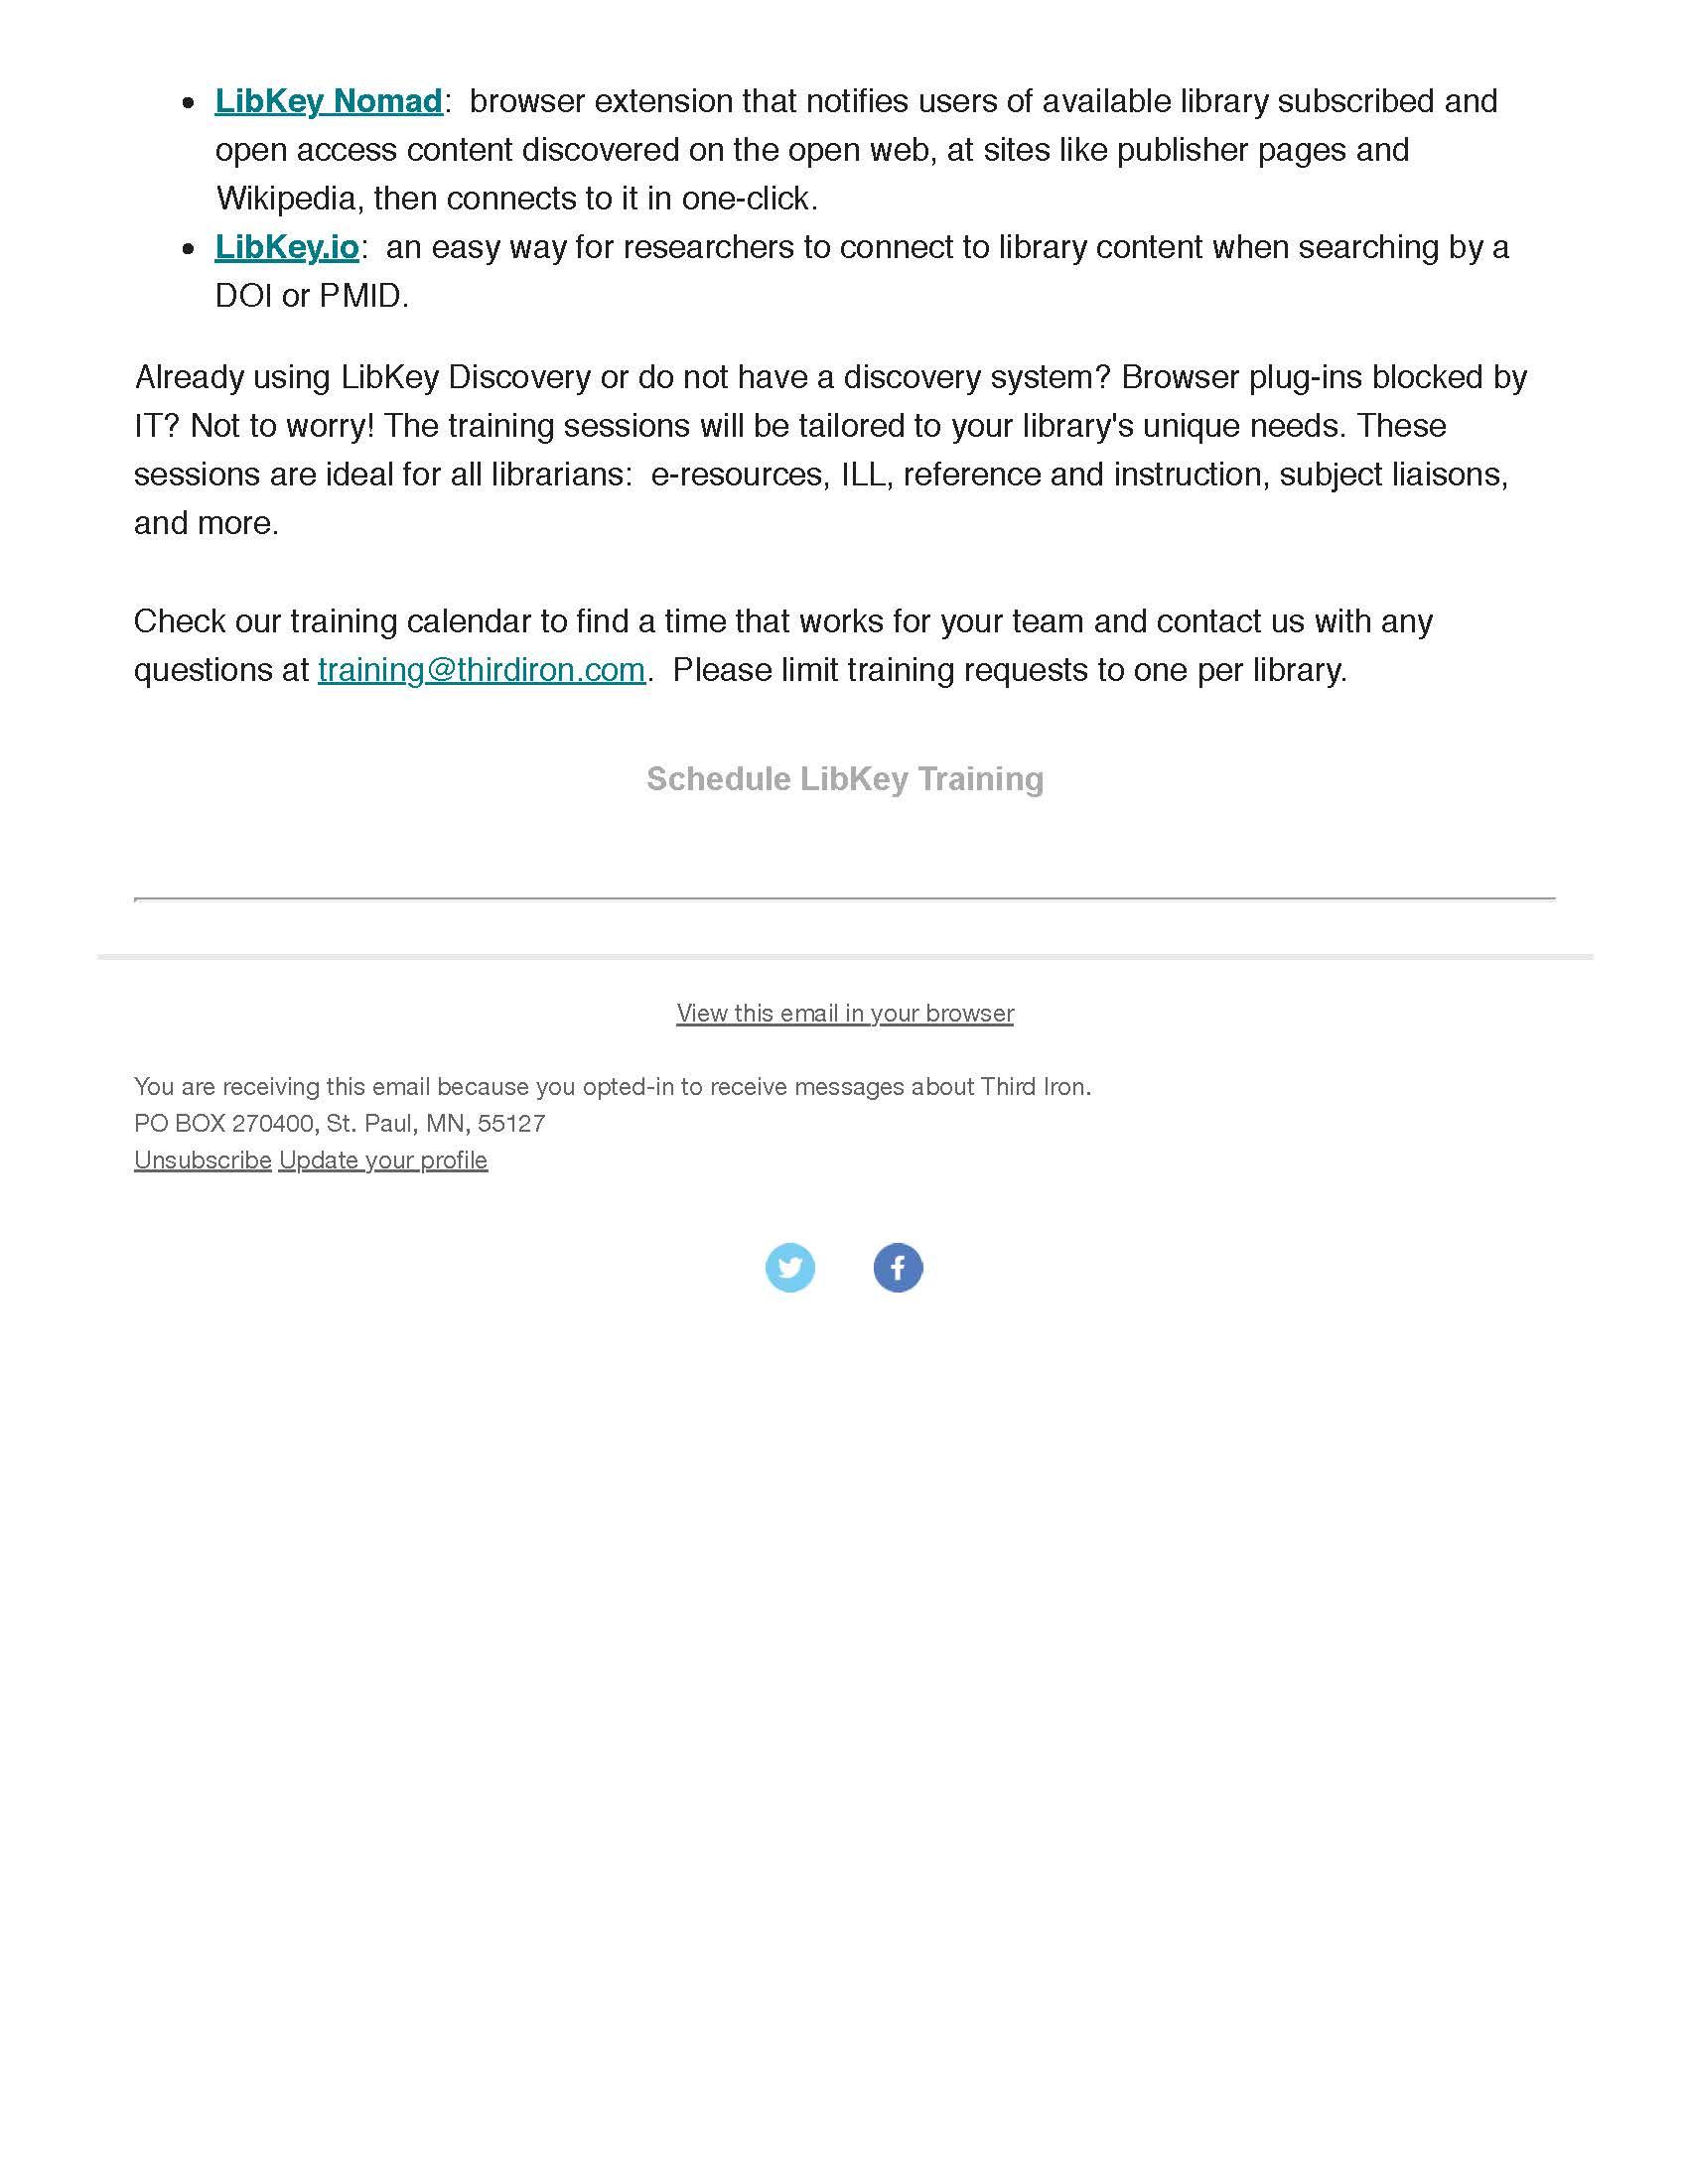 Third Iron Newsletter 7-27-2020_Page_3